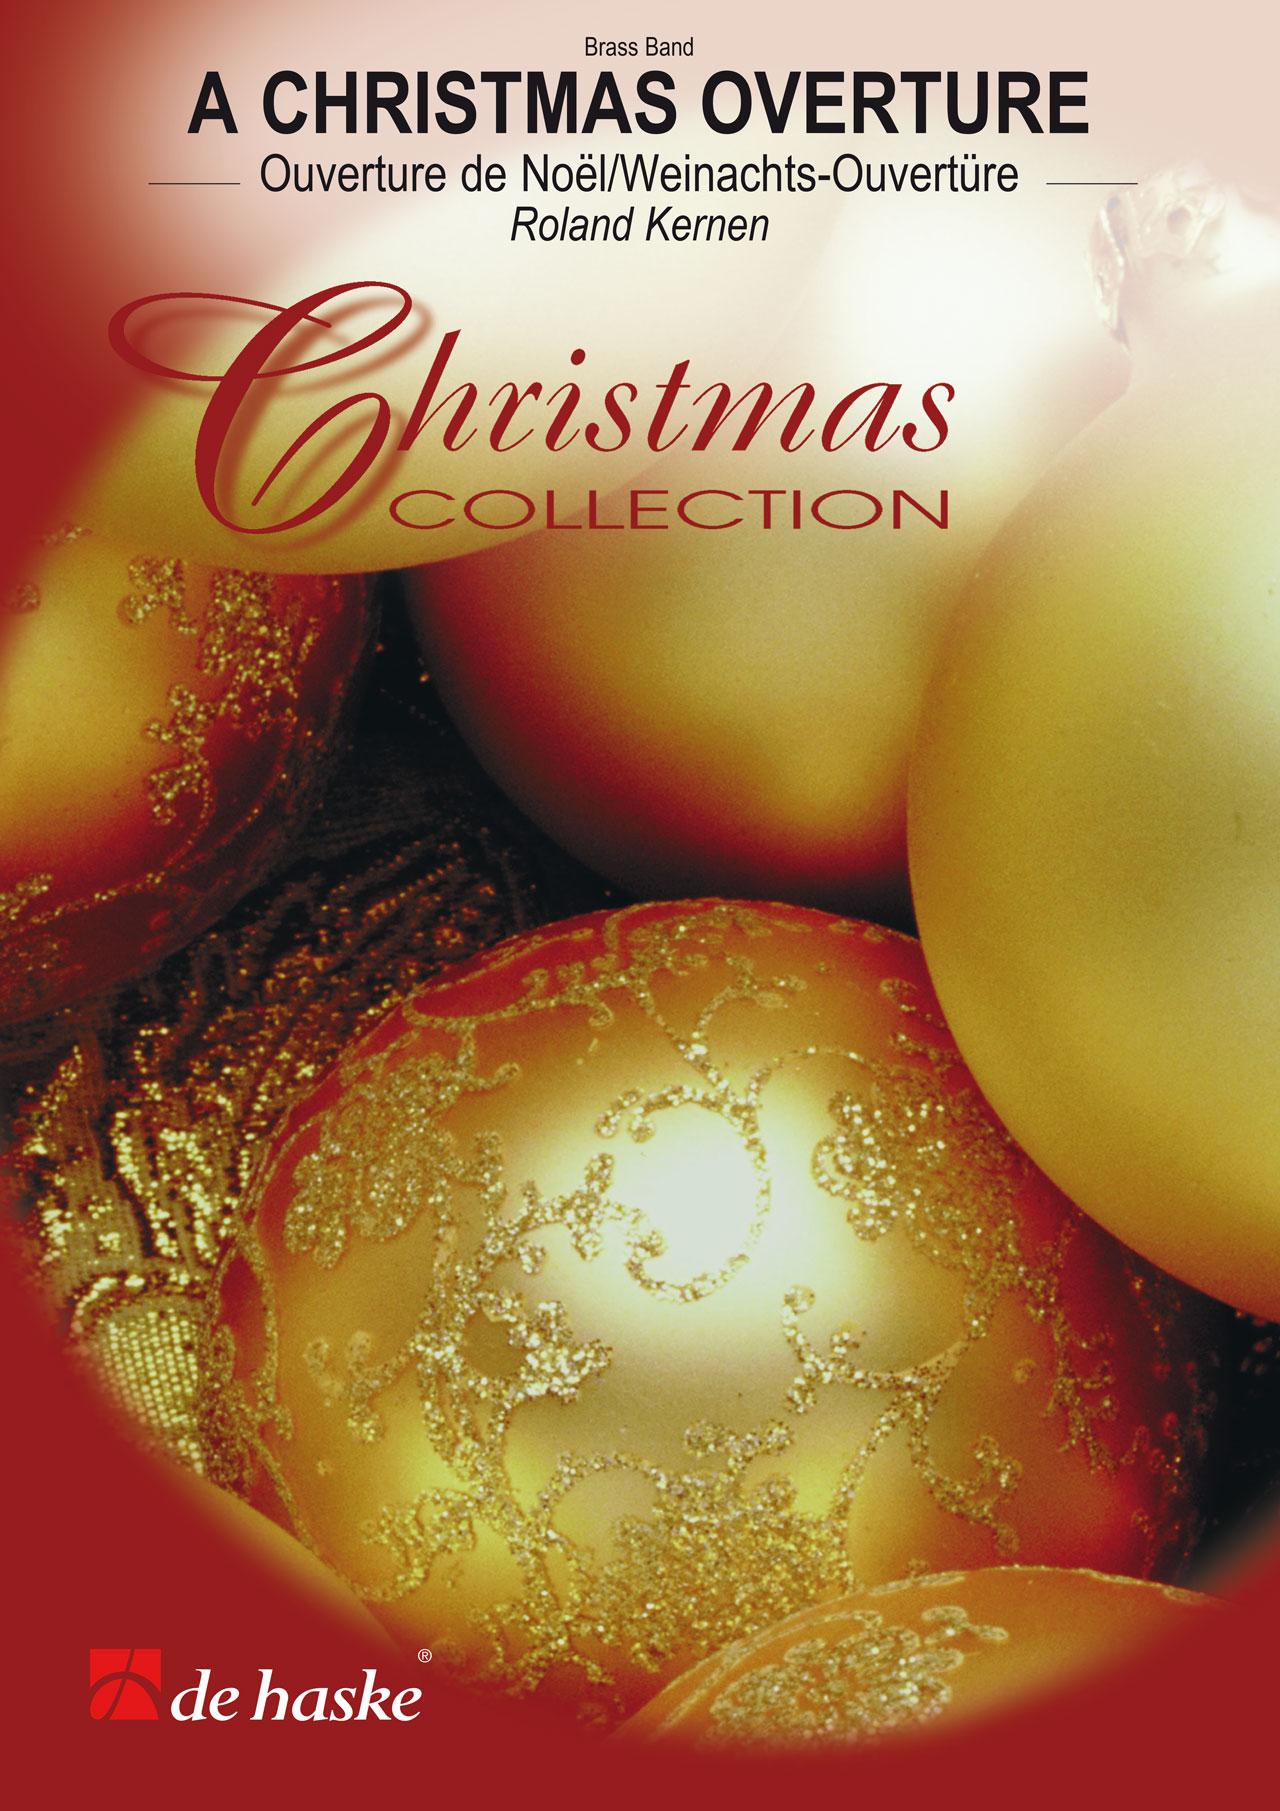 Roland Kernen: A Christmas Overture: Brass Band: Score & Parts